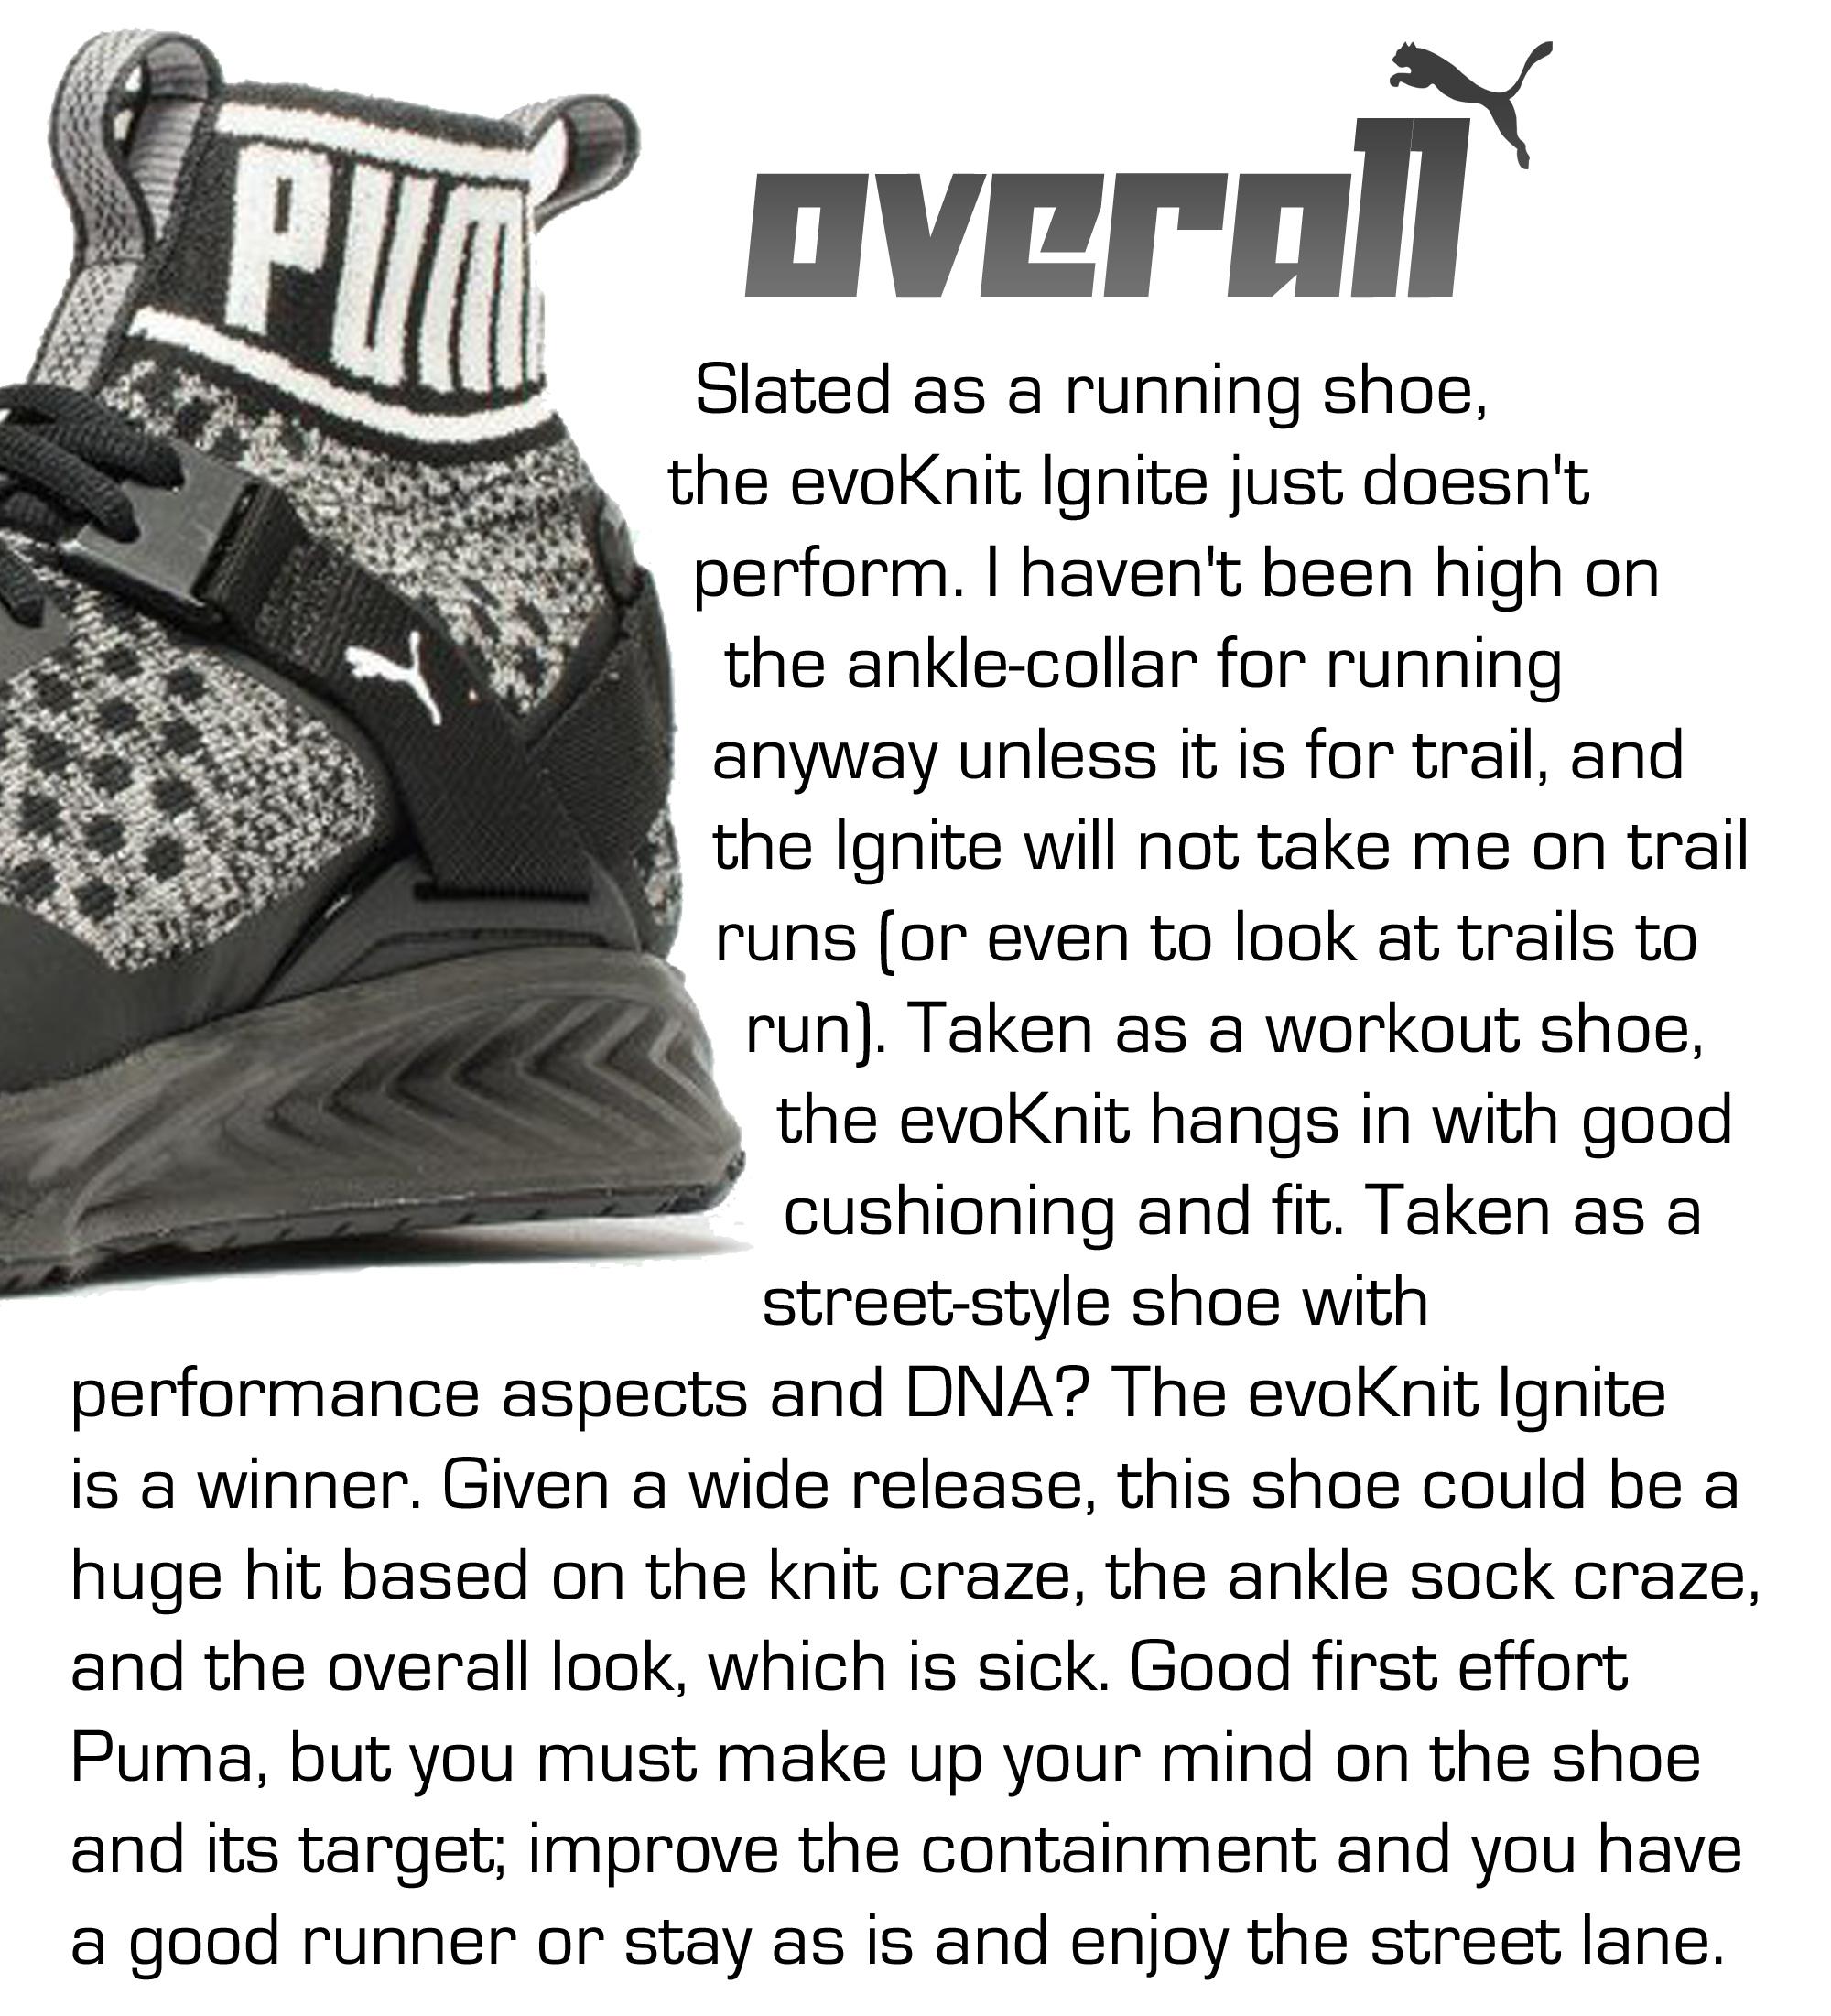 PUMA evoknit Ignite performance review 4